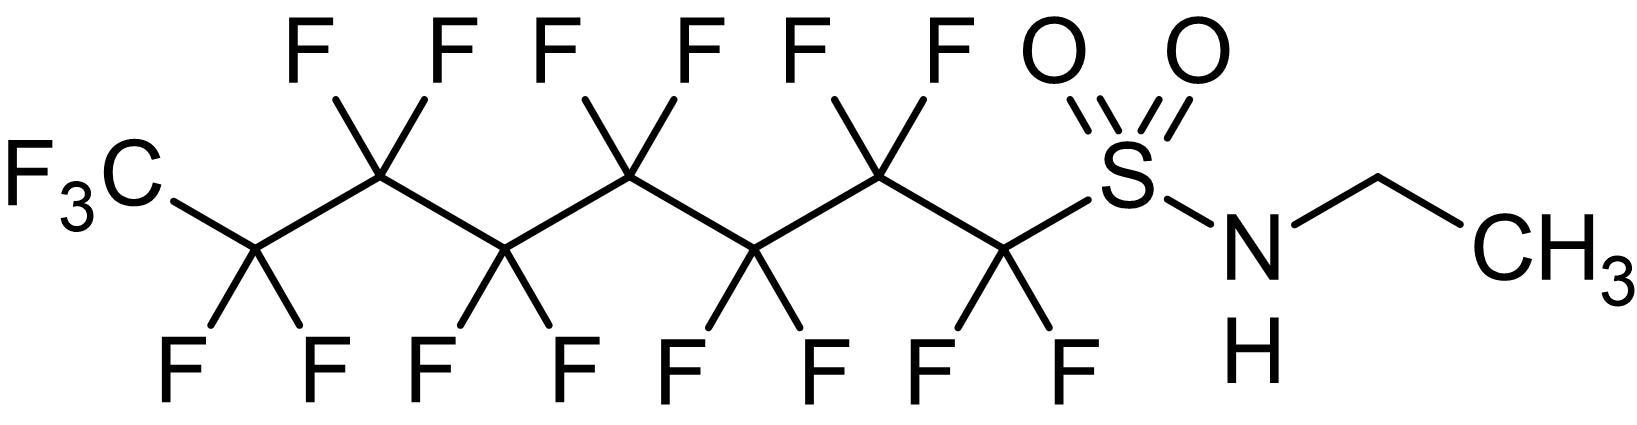 Chemical Structure - Sulfluramid, Perfluorinated pesticide (ab142699)